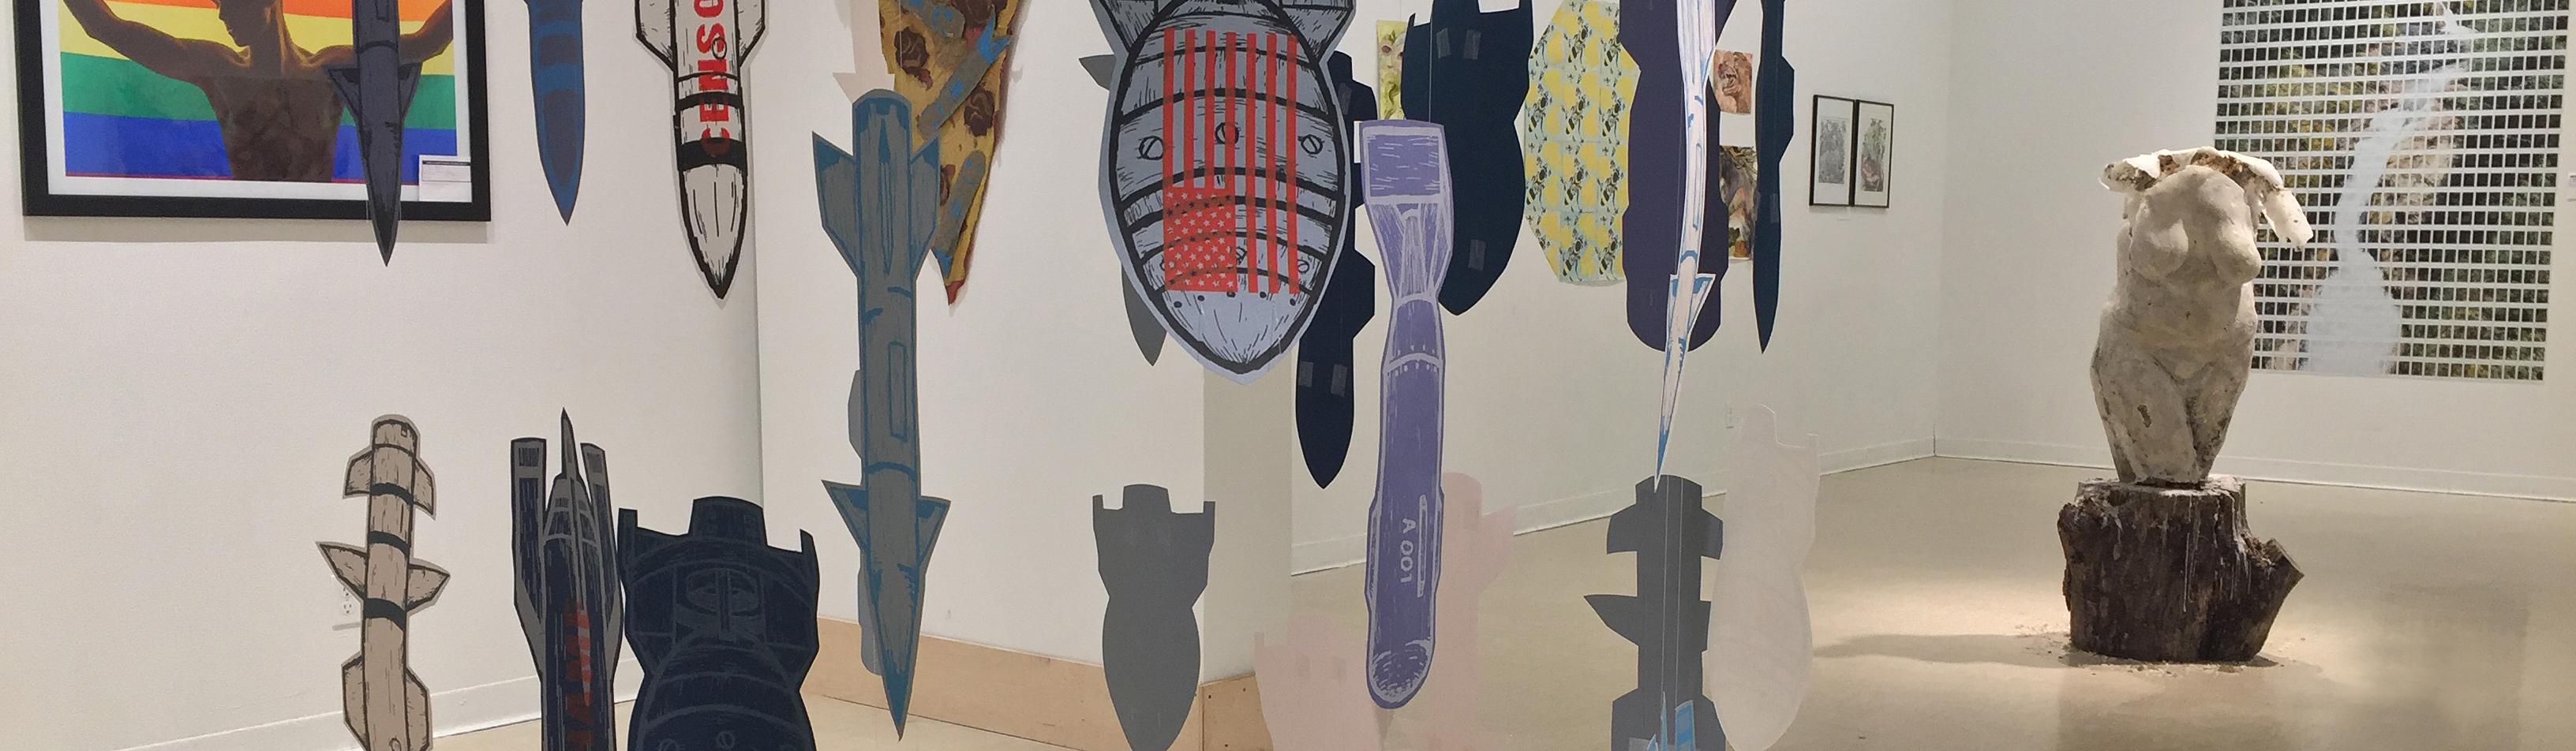 The Mary Schiller Myers School Of Art : The University Of Akron Throughout University Of Akron Holiday Calendar